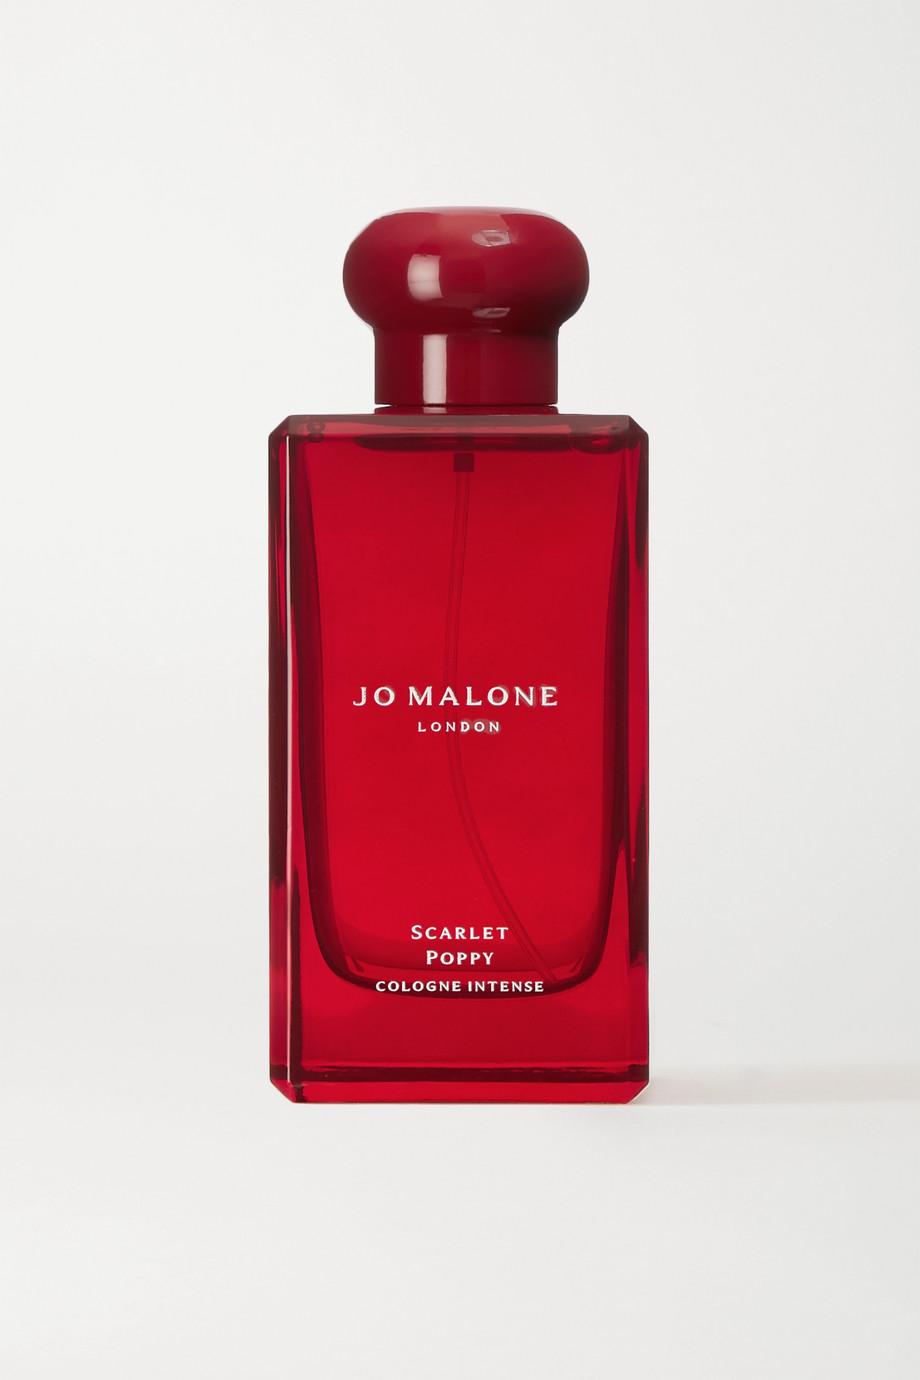 Jo Malone London Scarlet Poppy Cologne Intense, 100ml